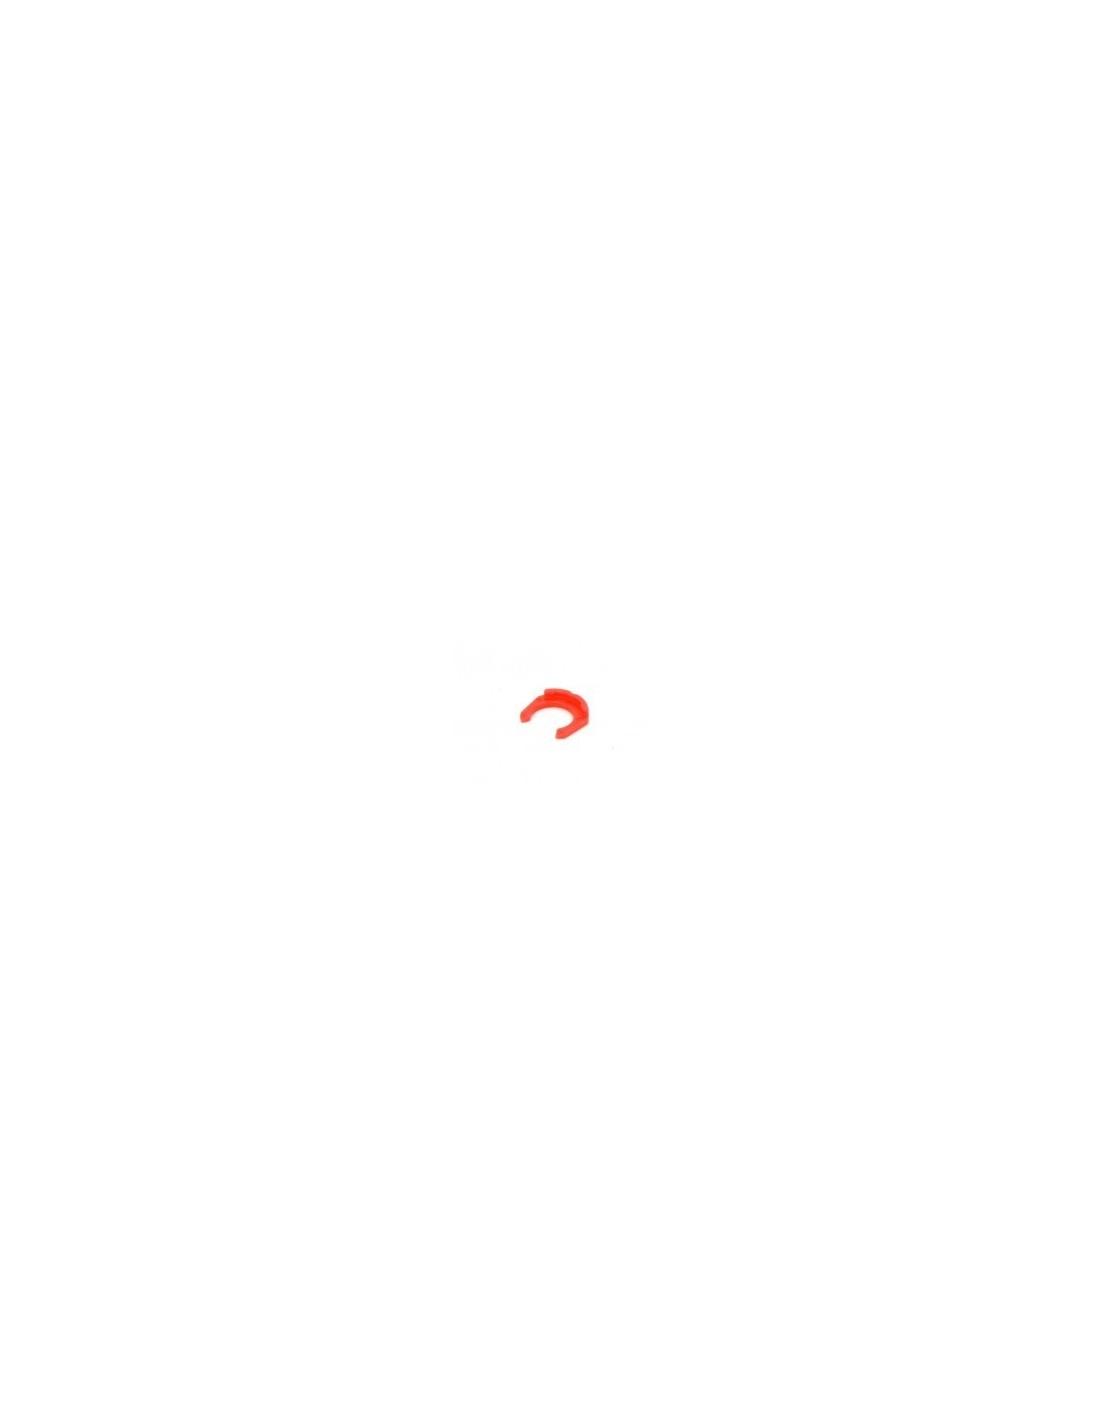 "SPO01333 - DM clip 6 mm (1/4"") (ALC06M)"